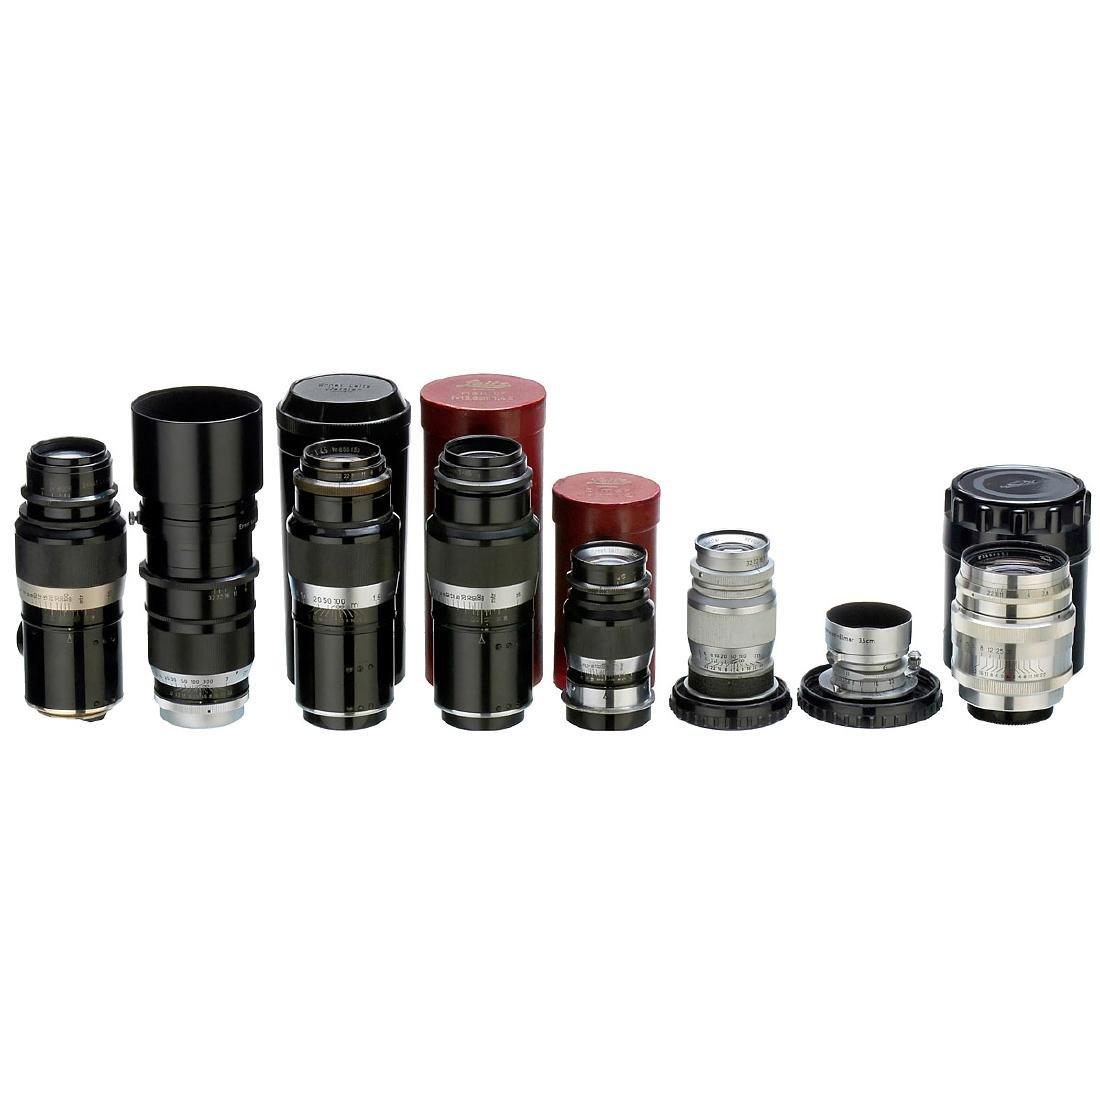 7 Leitz M39 Screw-Mount Lenses